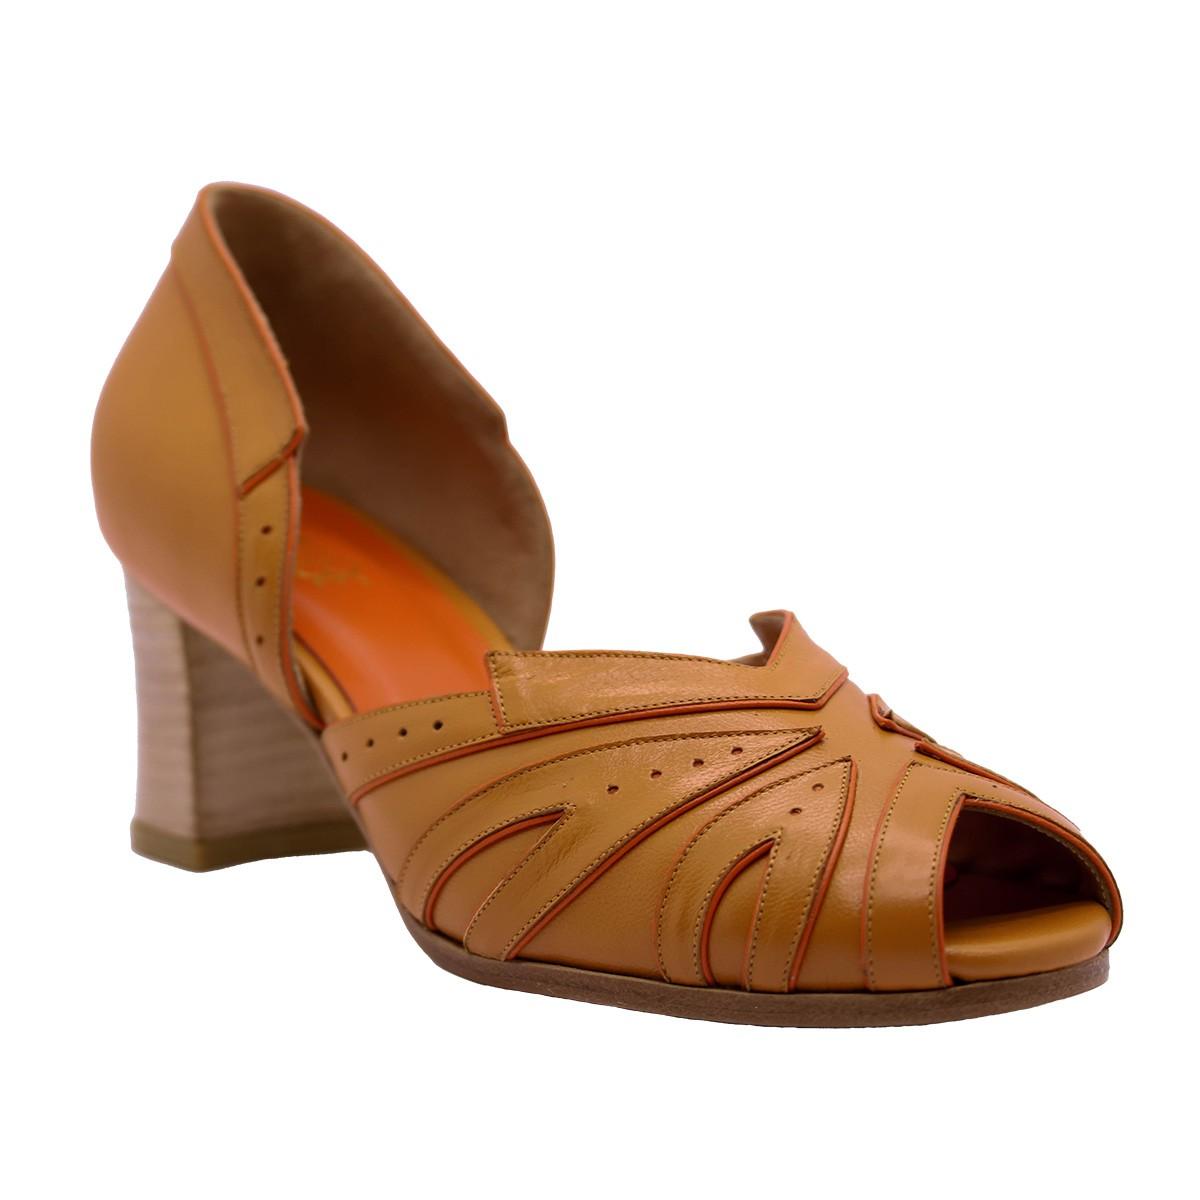 Sapato Manolo Pelica Laranja 6 cm